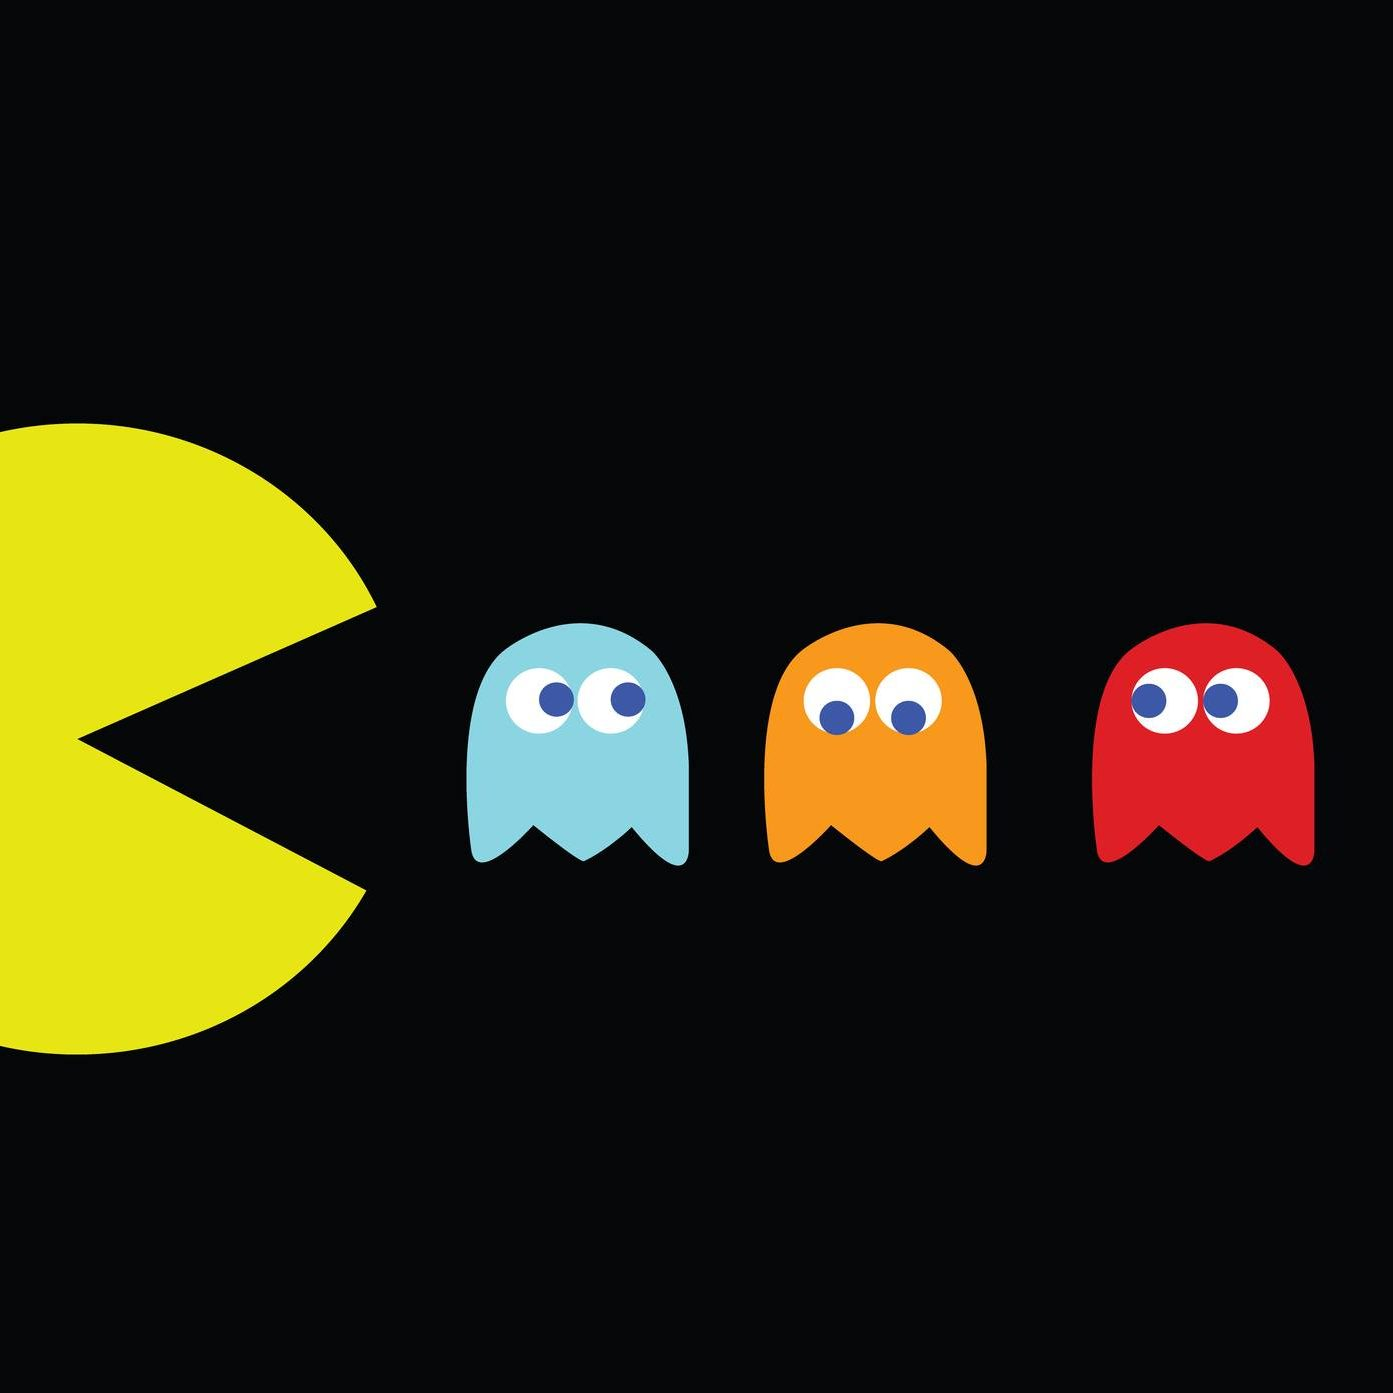 Pac-Man chasing ghosts